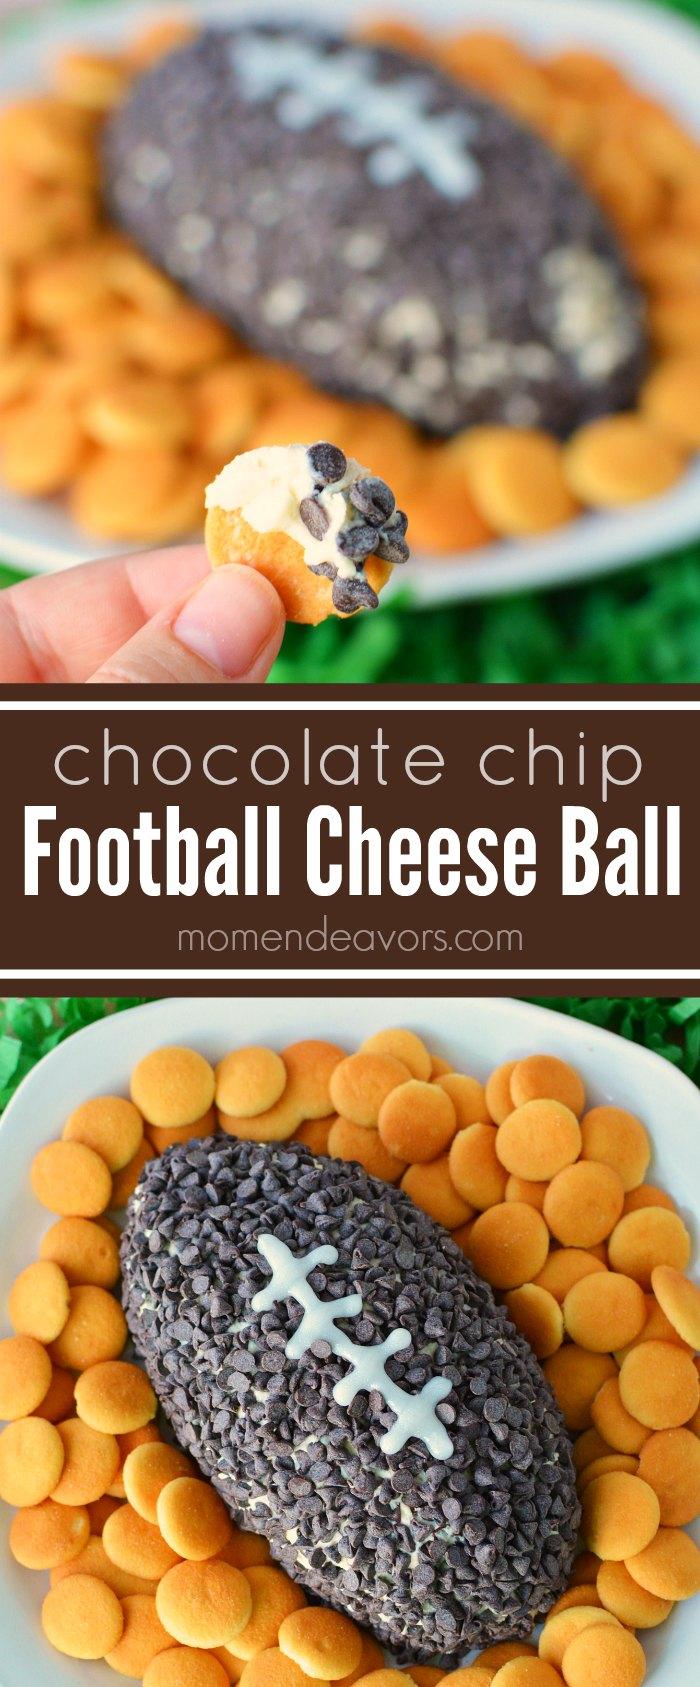 Chocolate Chip Football Cheese Ball Recipe